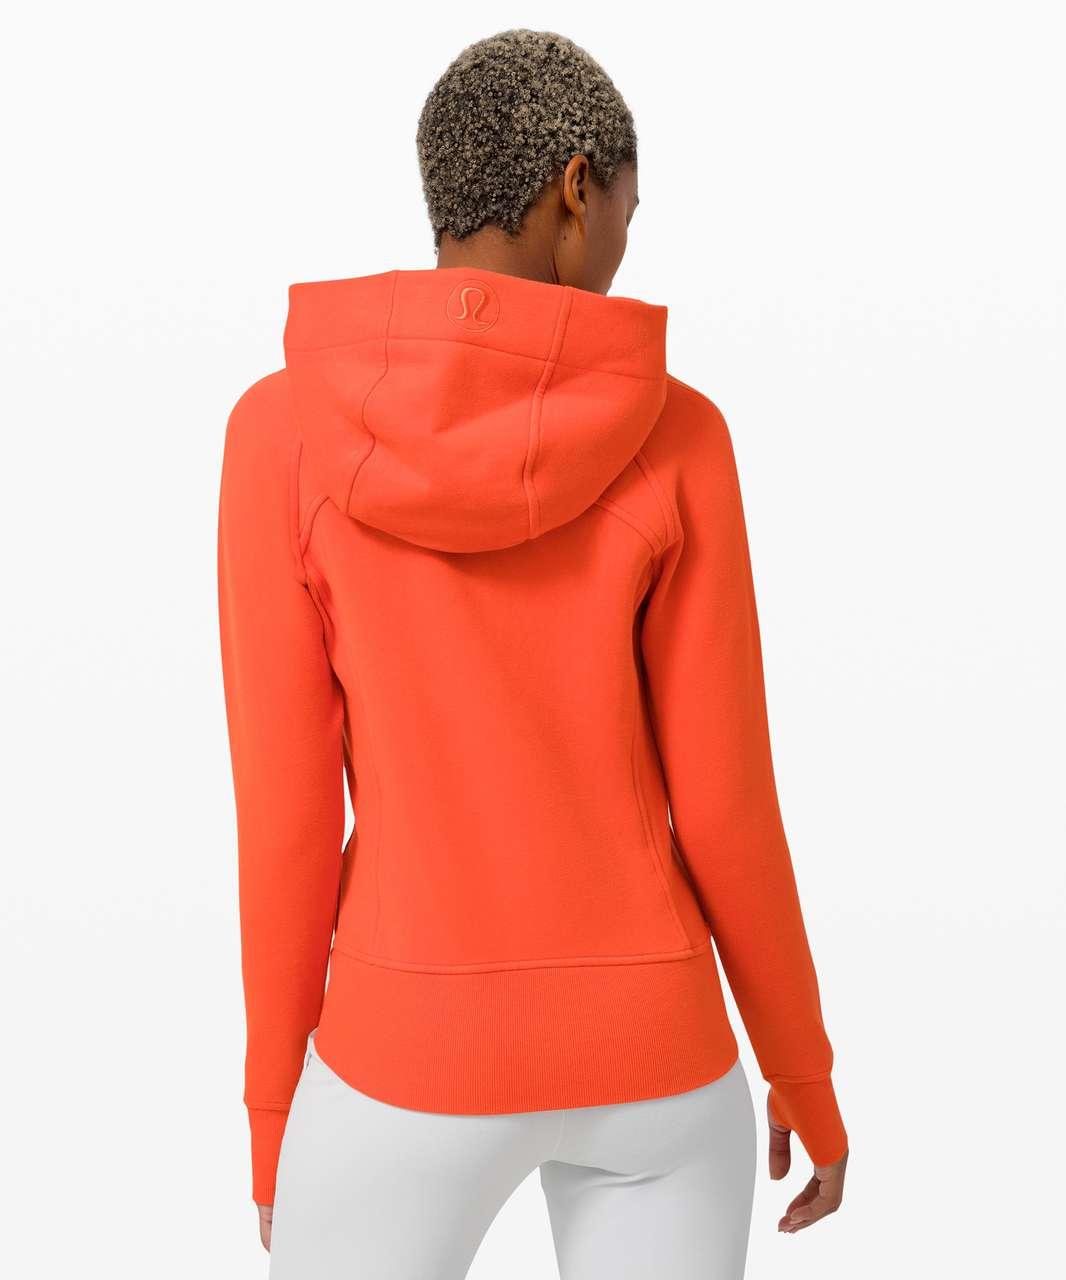 Lululemon Scuba Hoodie *Light Cotton Fleece - Brick